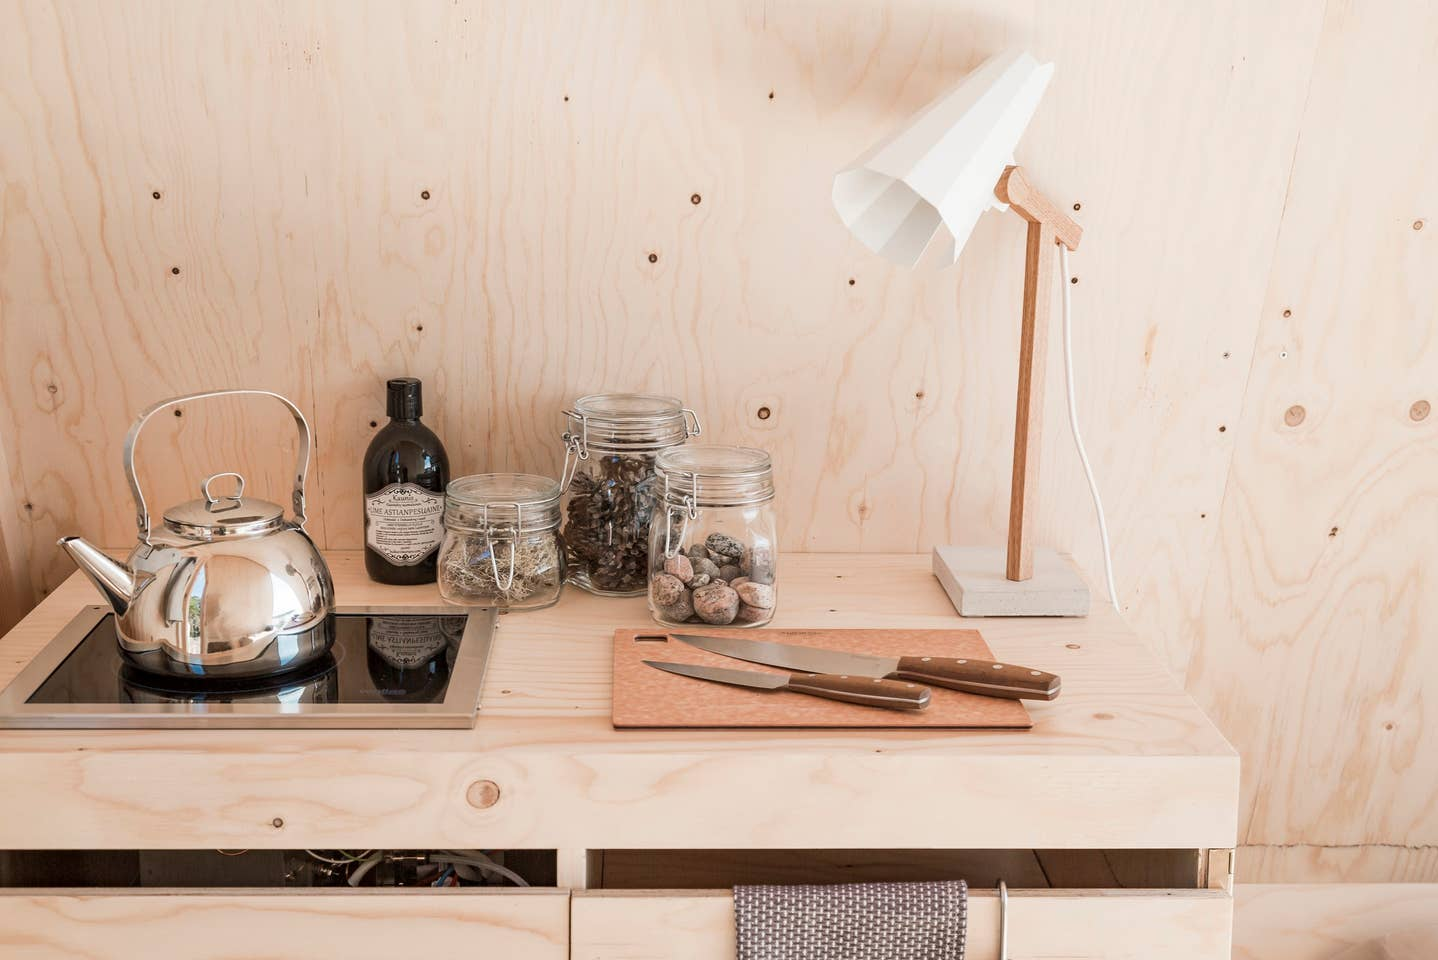 thatscandinavianfeeling airbnb finland interior kitchen cozy view